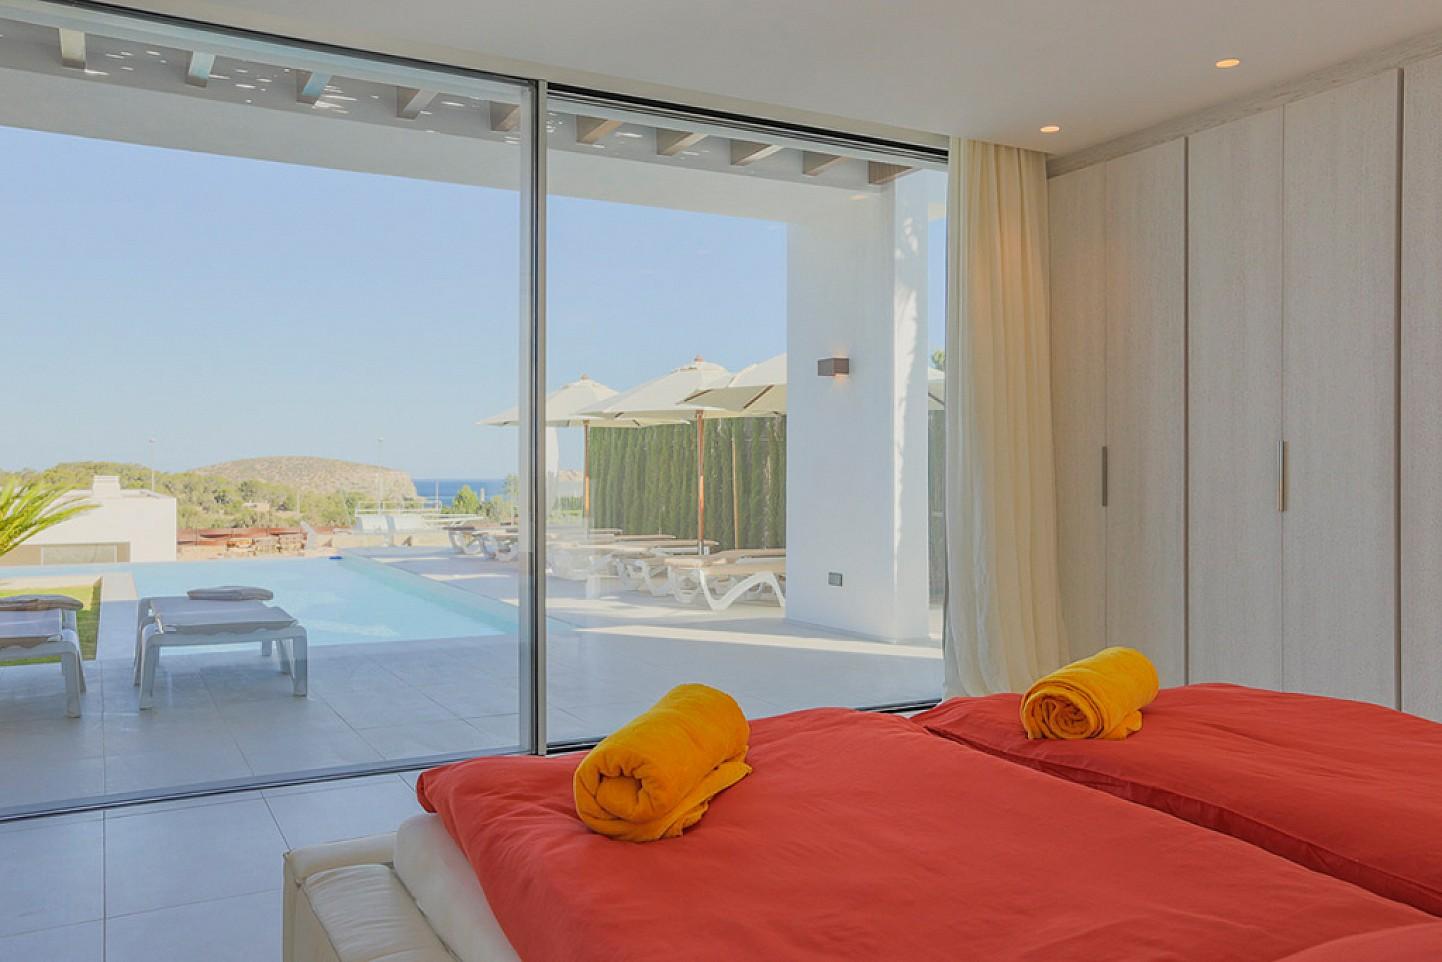 Dormitorio con salida a la terraza